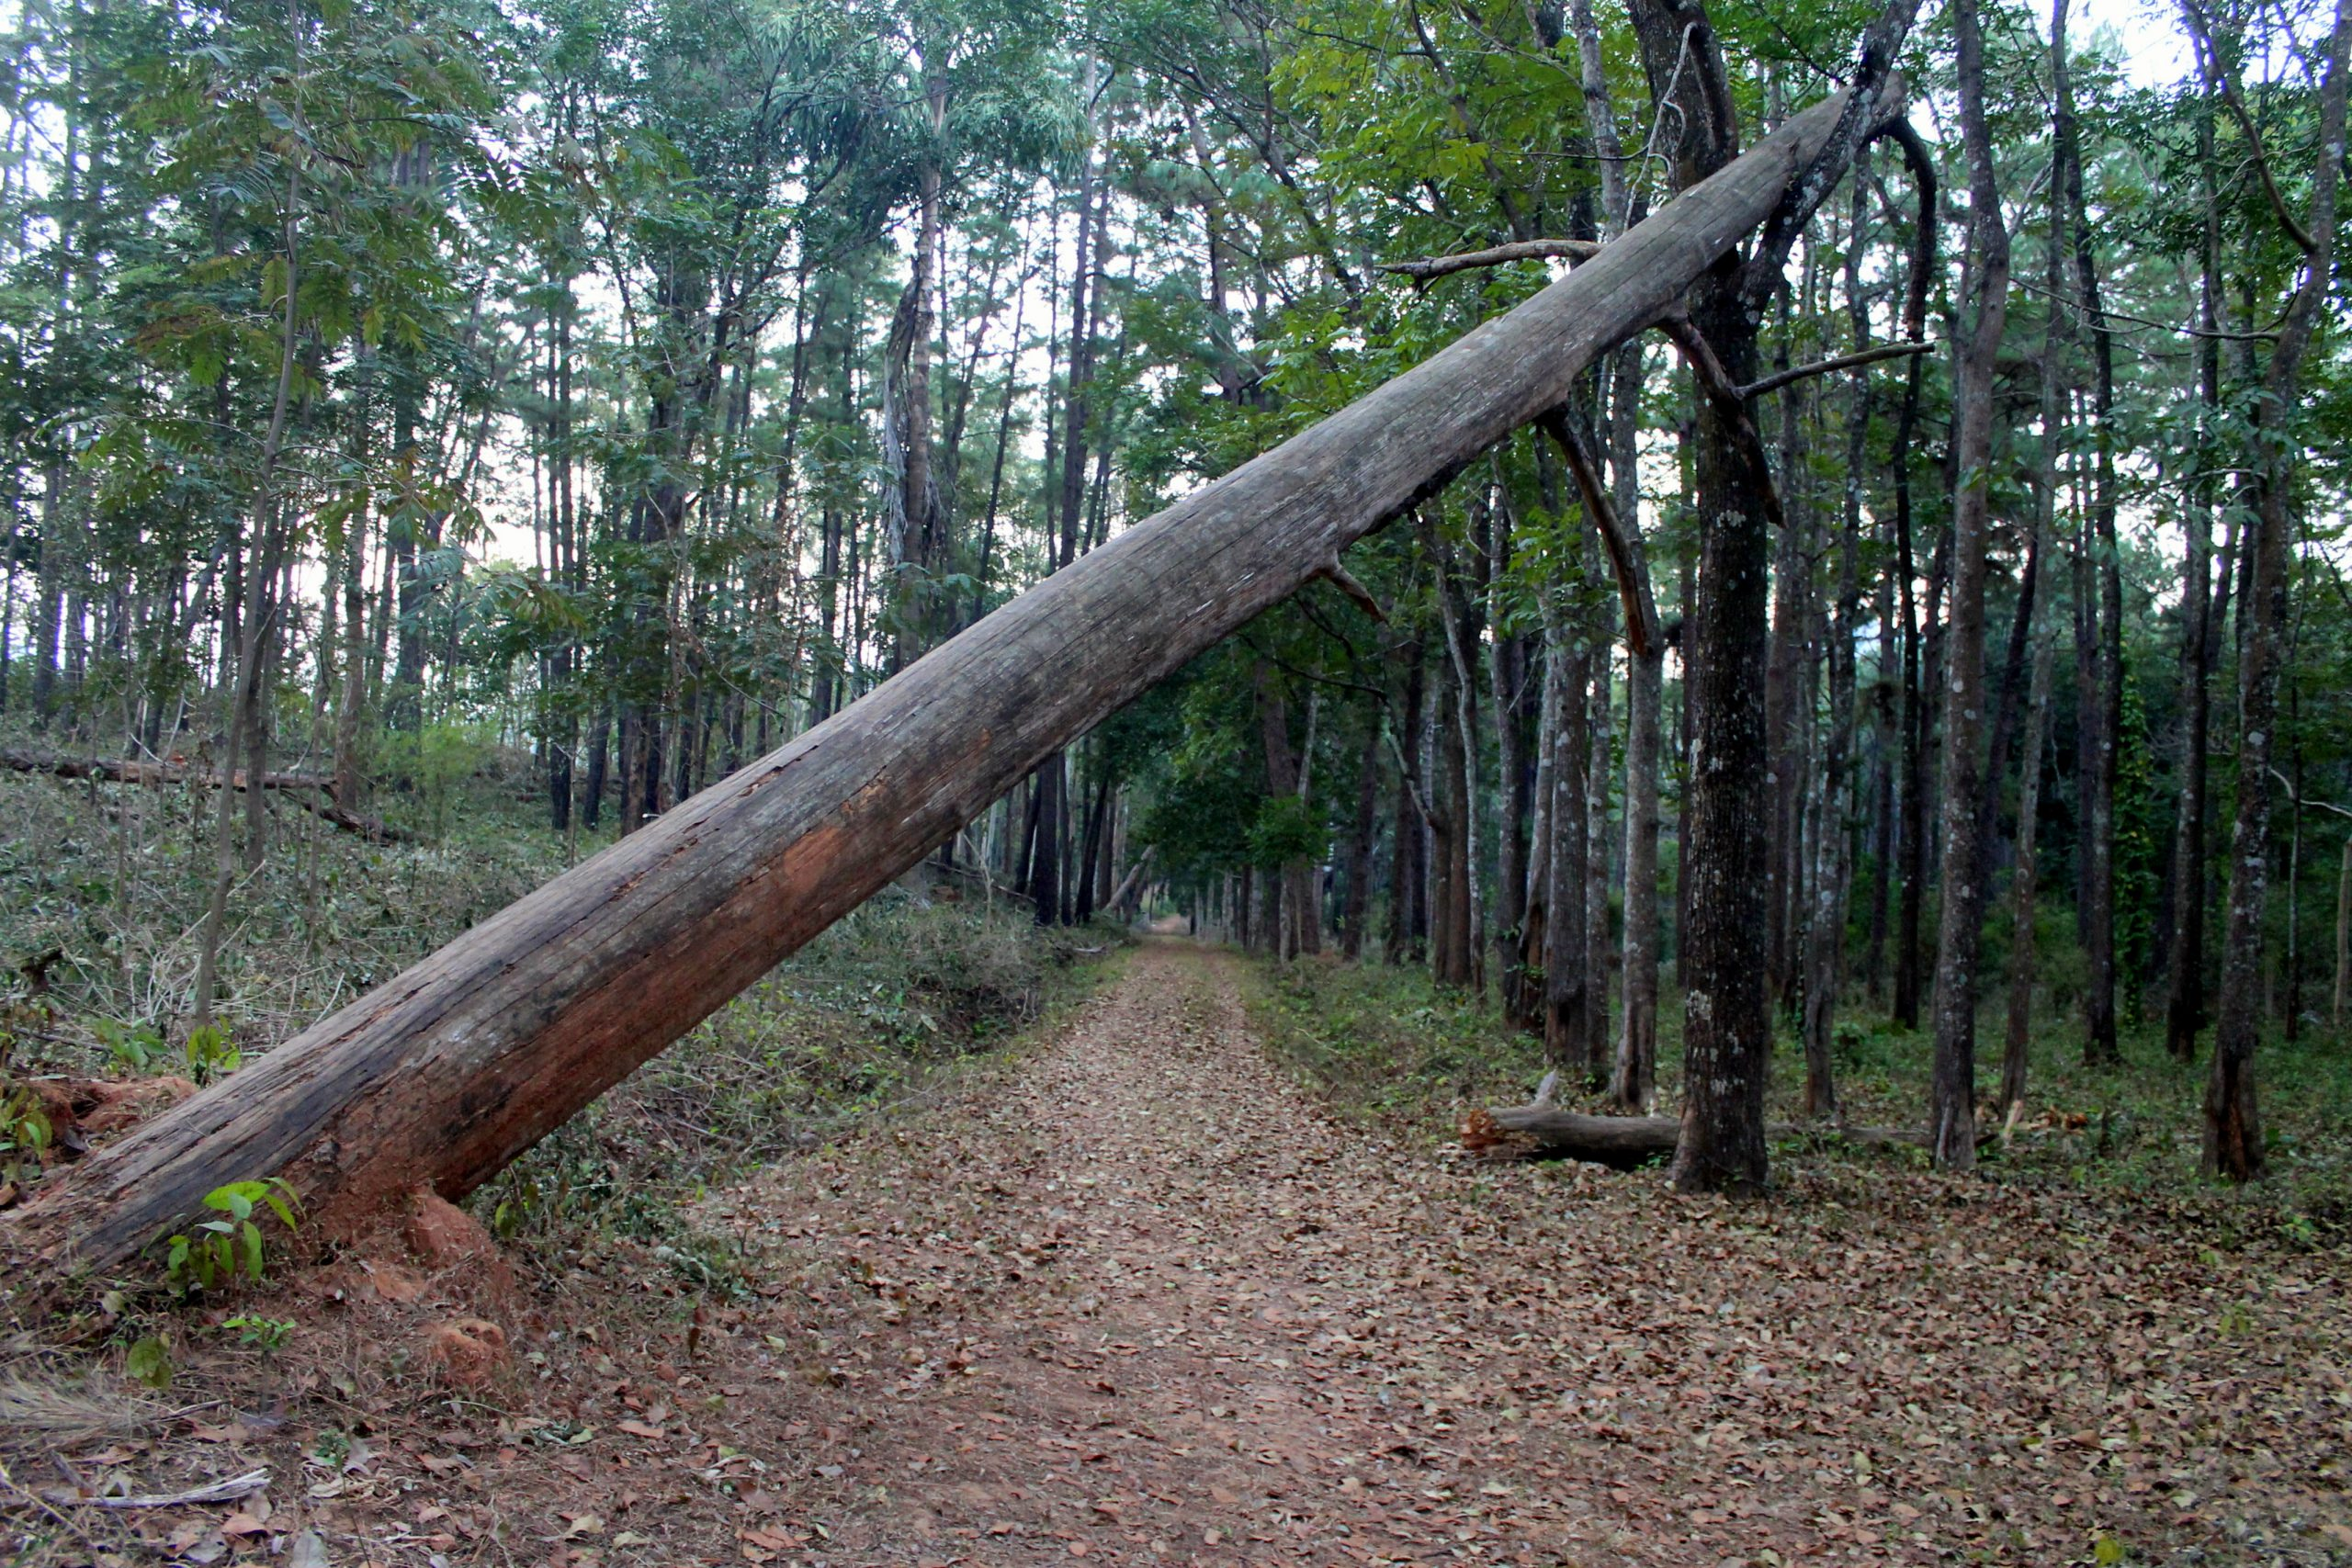 A broken tree in a jungle